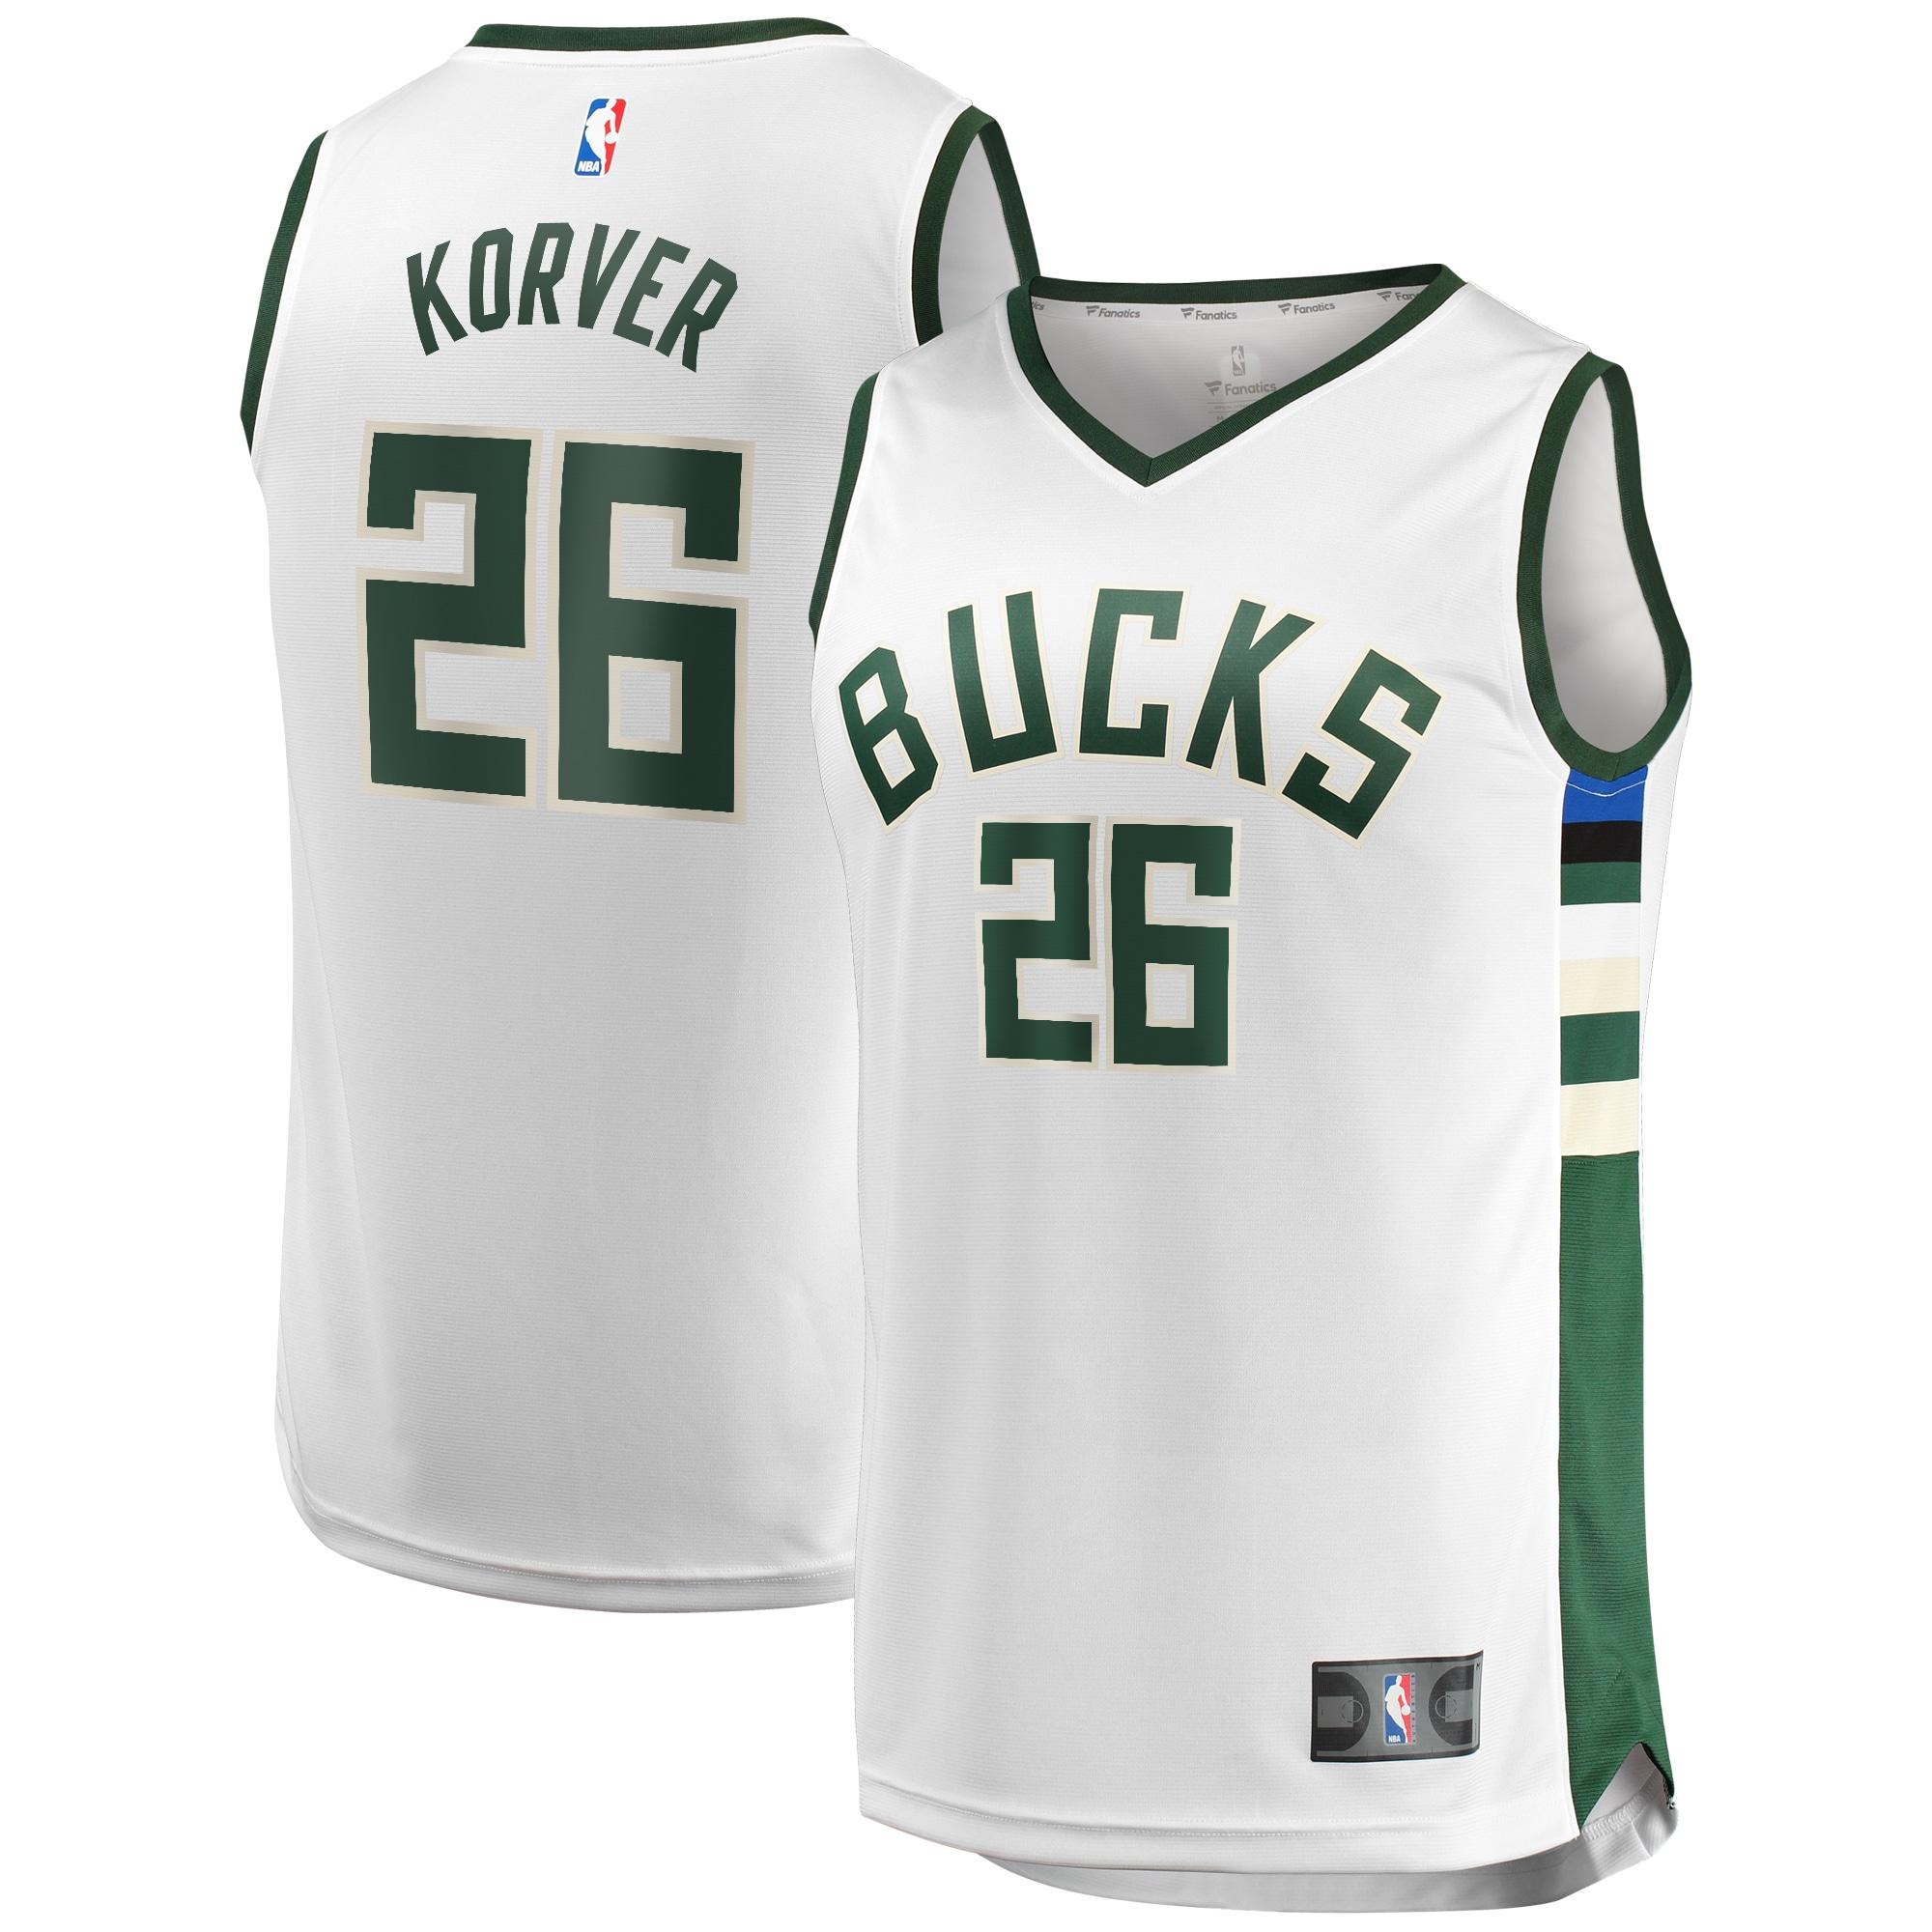 Kyle Korver Milwaukee Bucks Fanatics Branded Fast Break Replica Player Jersey White - Association Edition